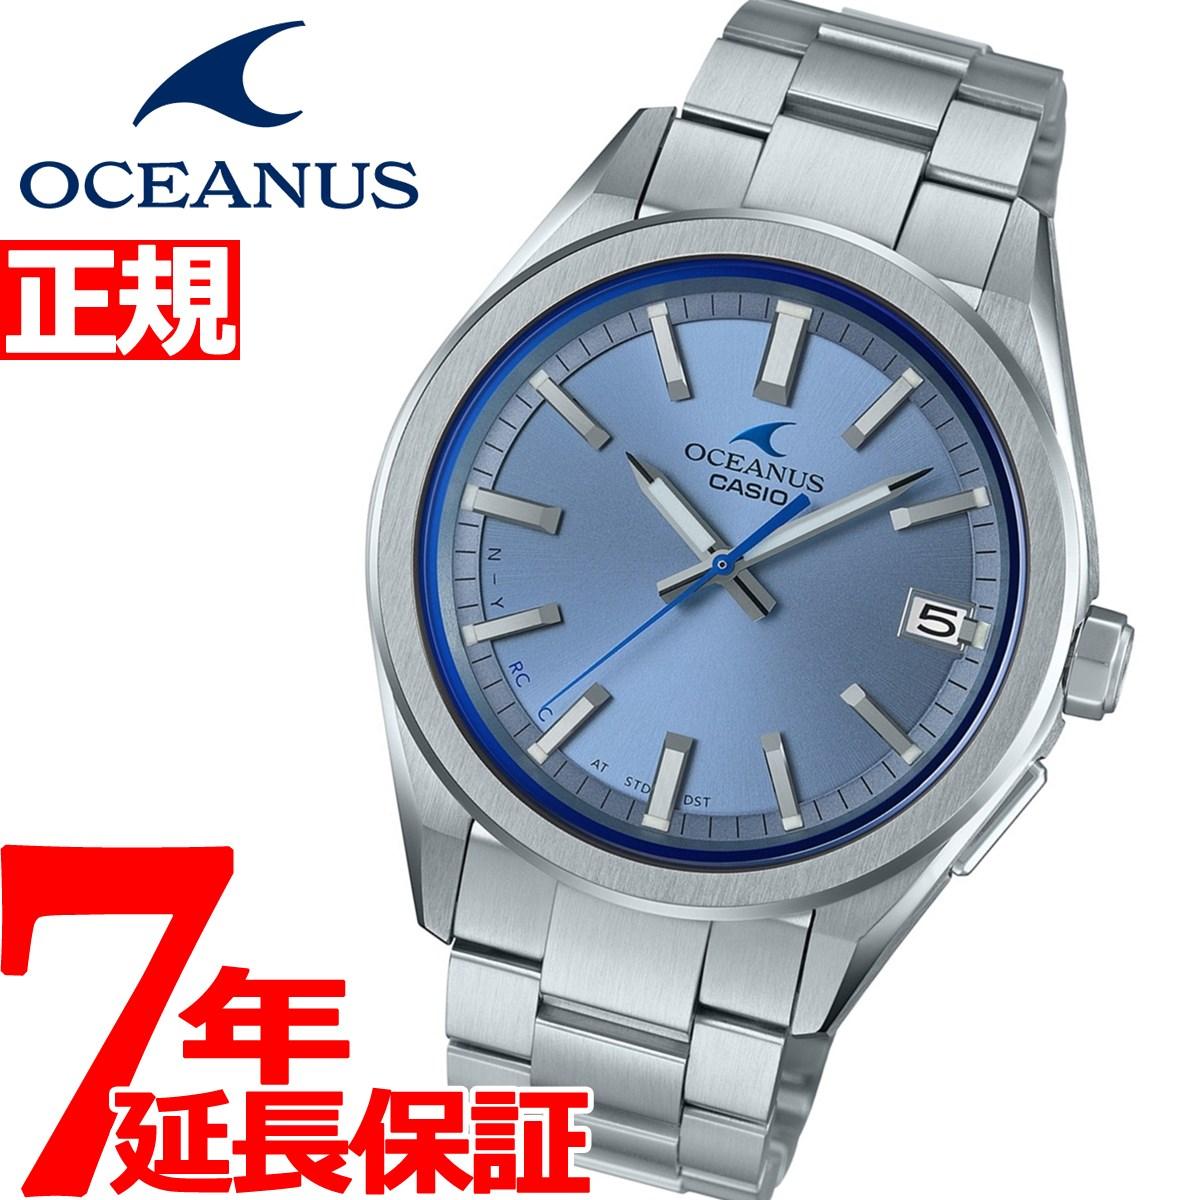 brand new 00dee 7e093 カシオ オシアナス 電波 ソーラー 腕時計 メンズ タフソーラー CASIO OCEANUS CLASSIC LINE  OCW-T200S-2AJF【2019 新作】 neelセレクトショップ